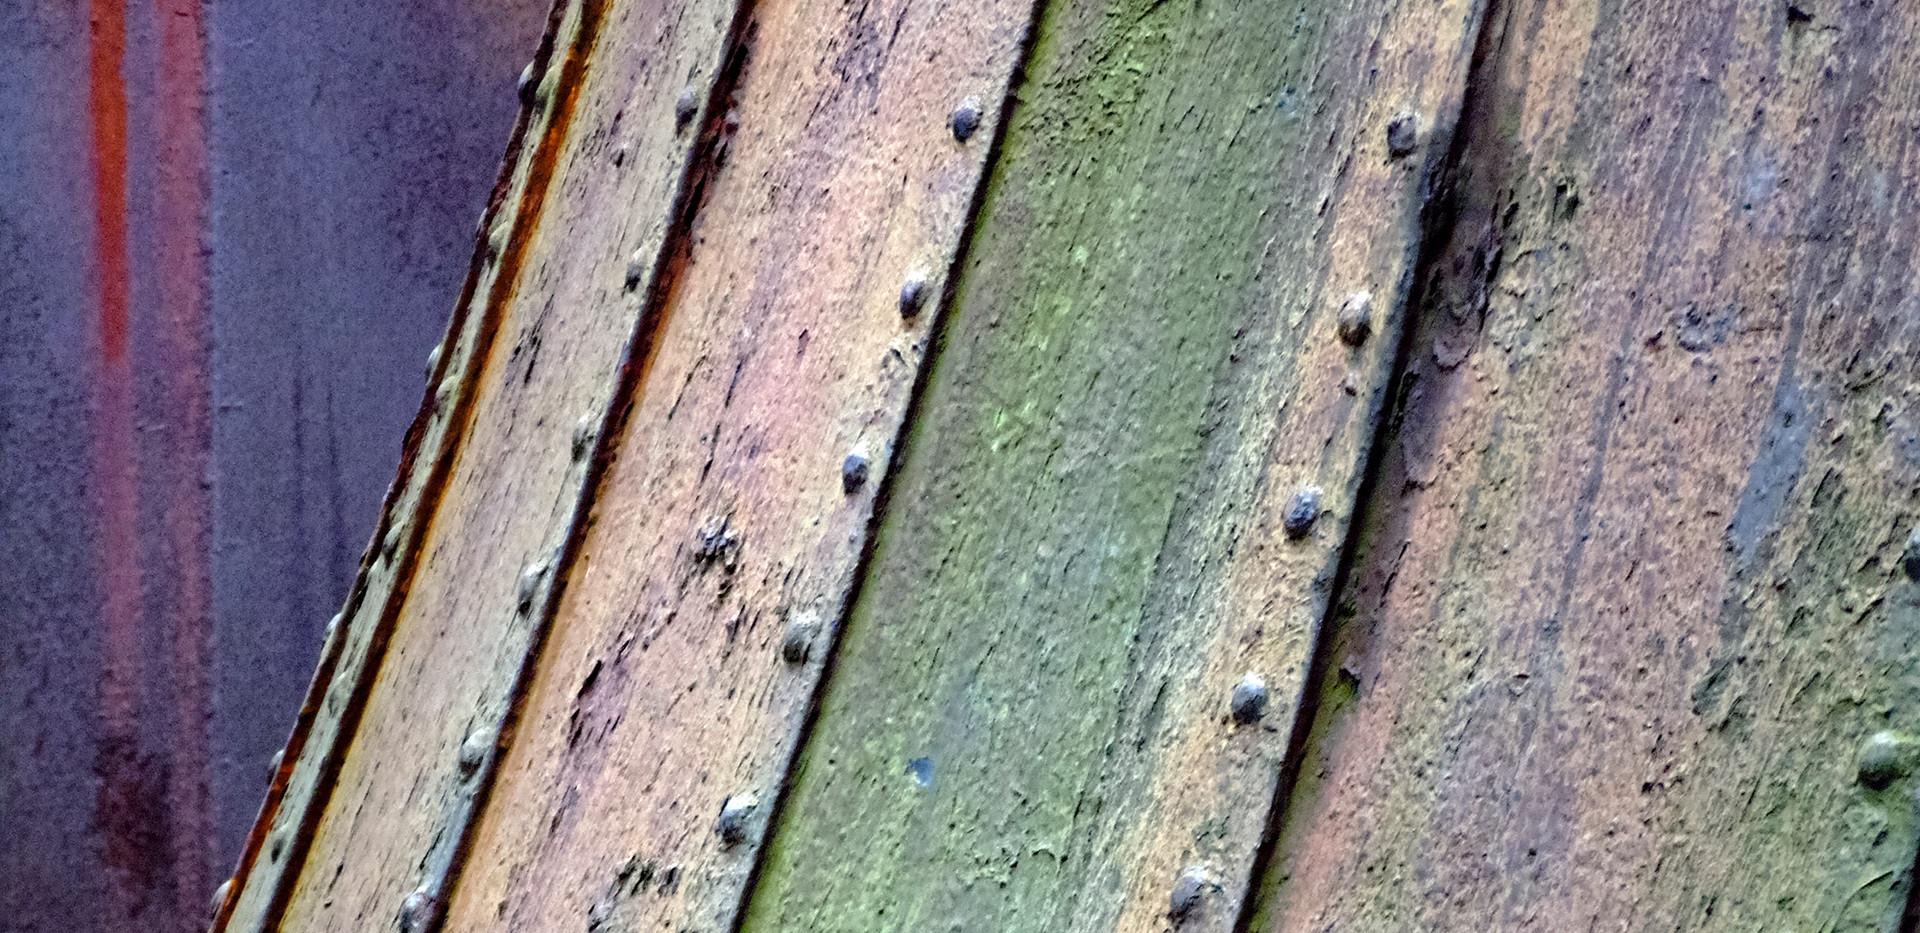 Rust & Fuscia 1 (Sloss)